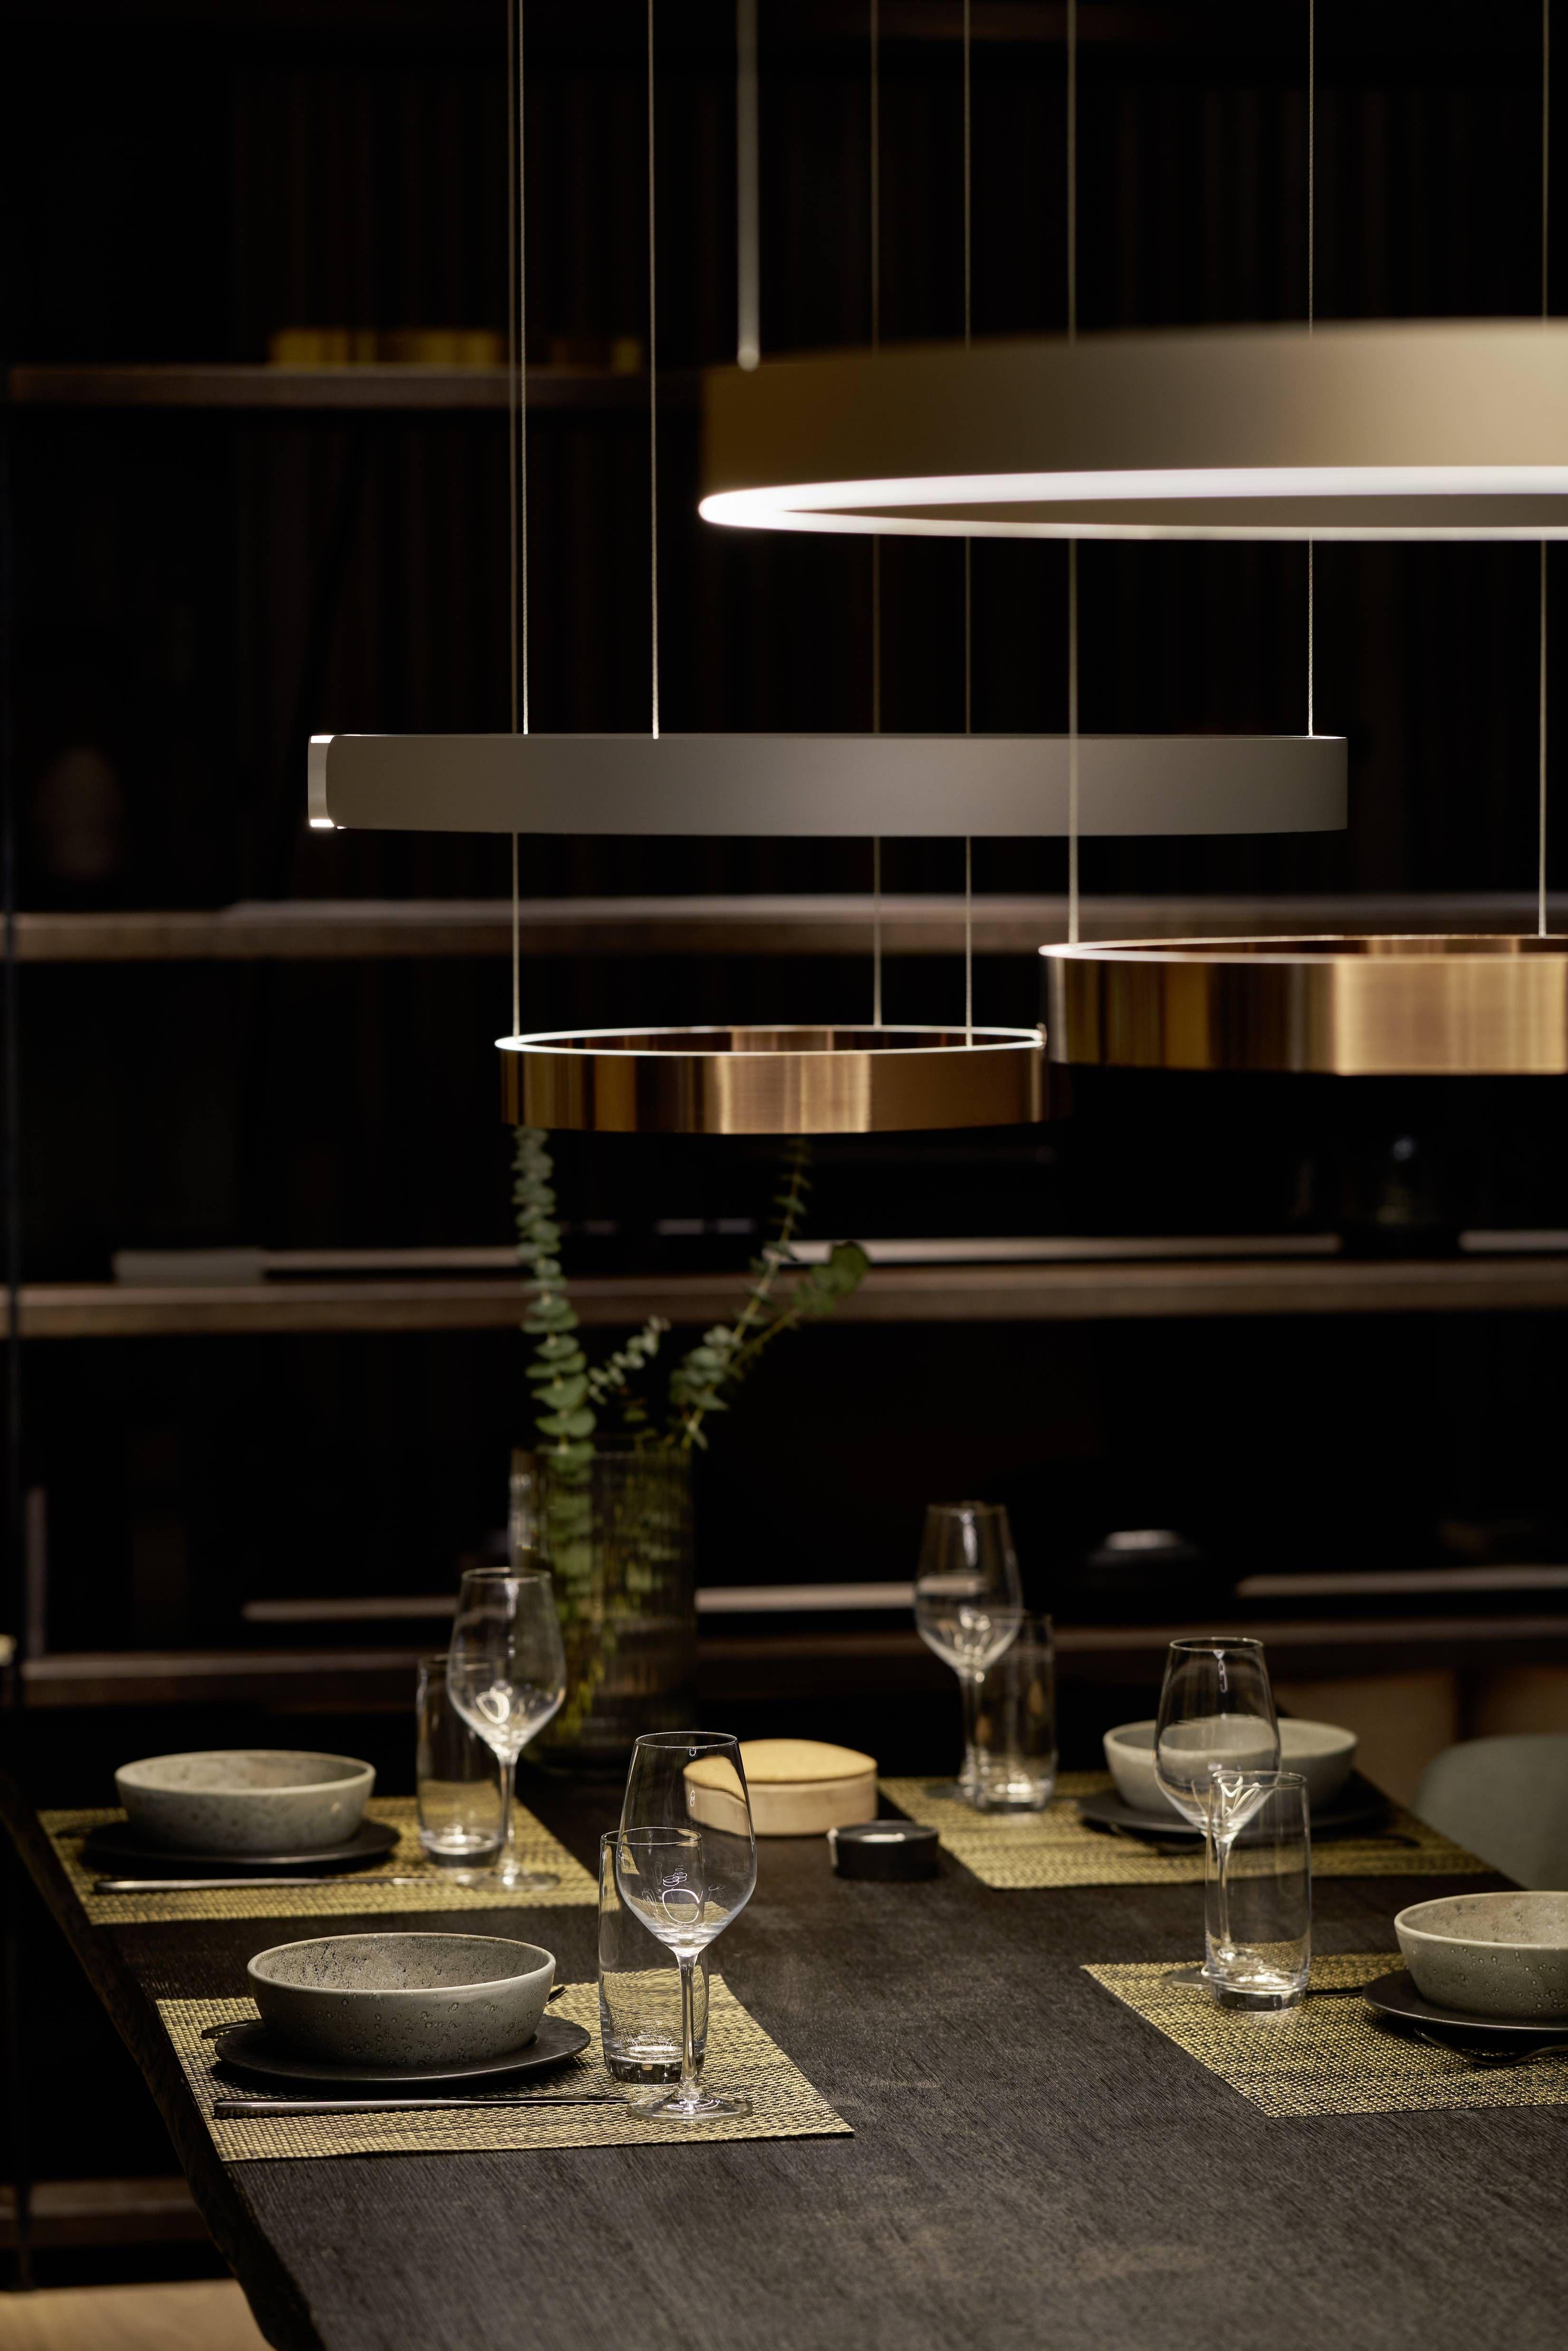 Dark Light Ambience Lamp Decor Light Kitchen Island Lighting